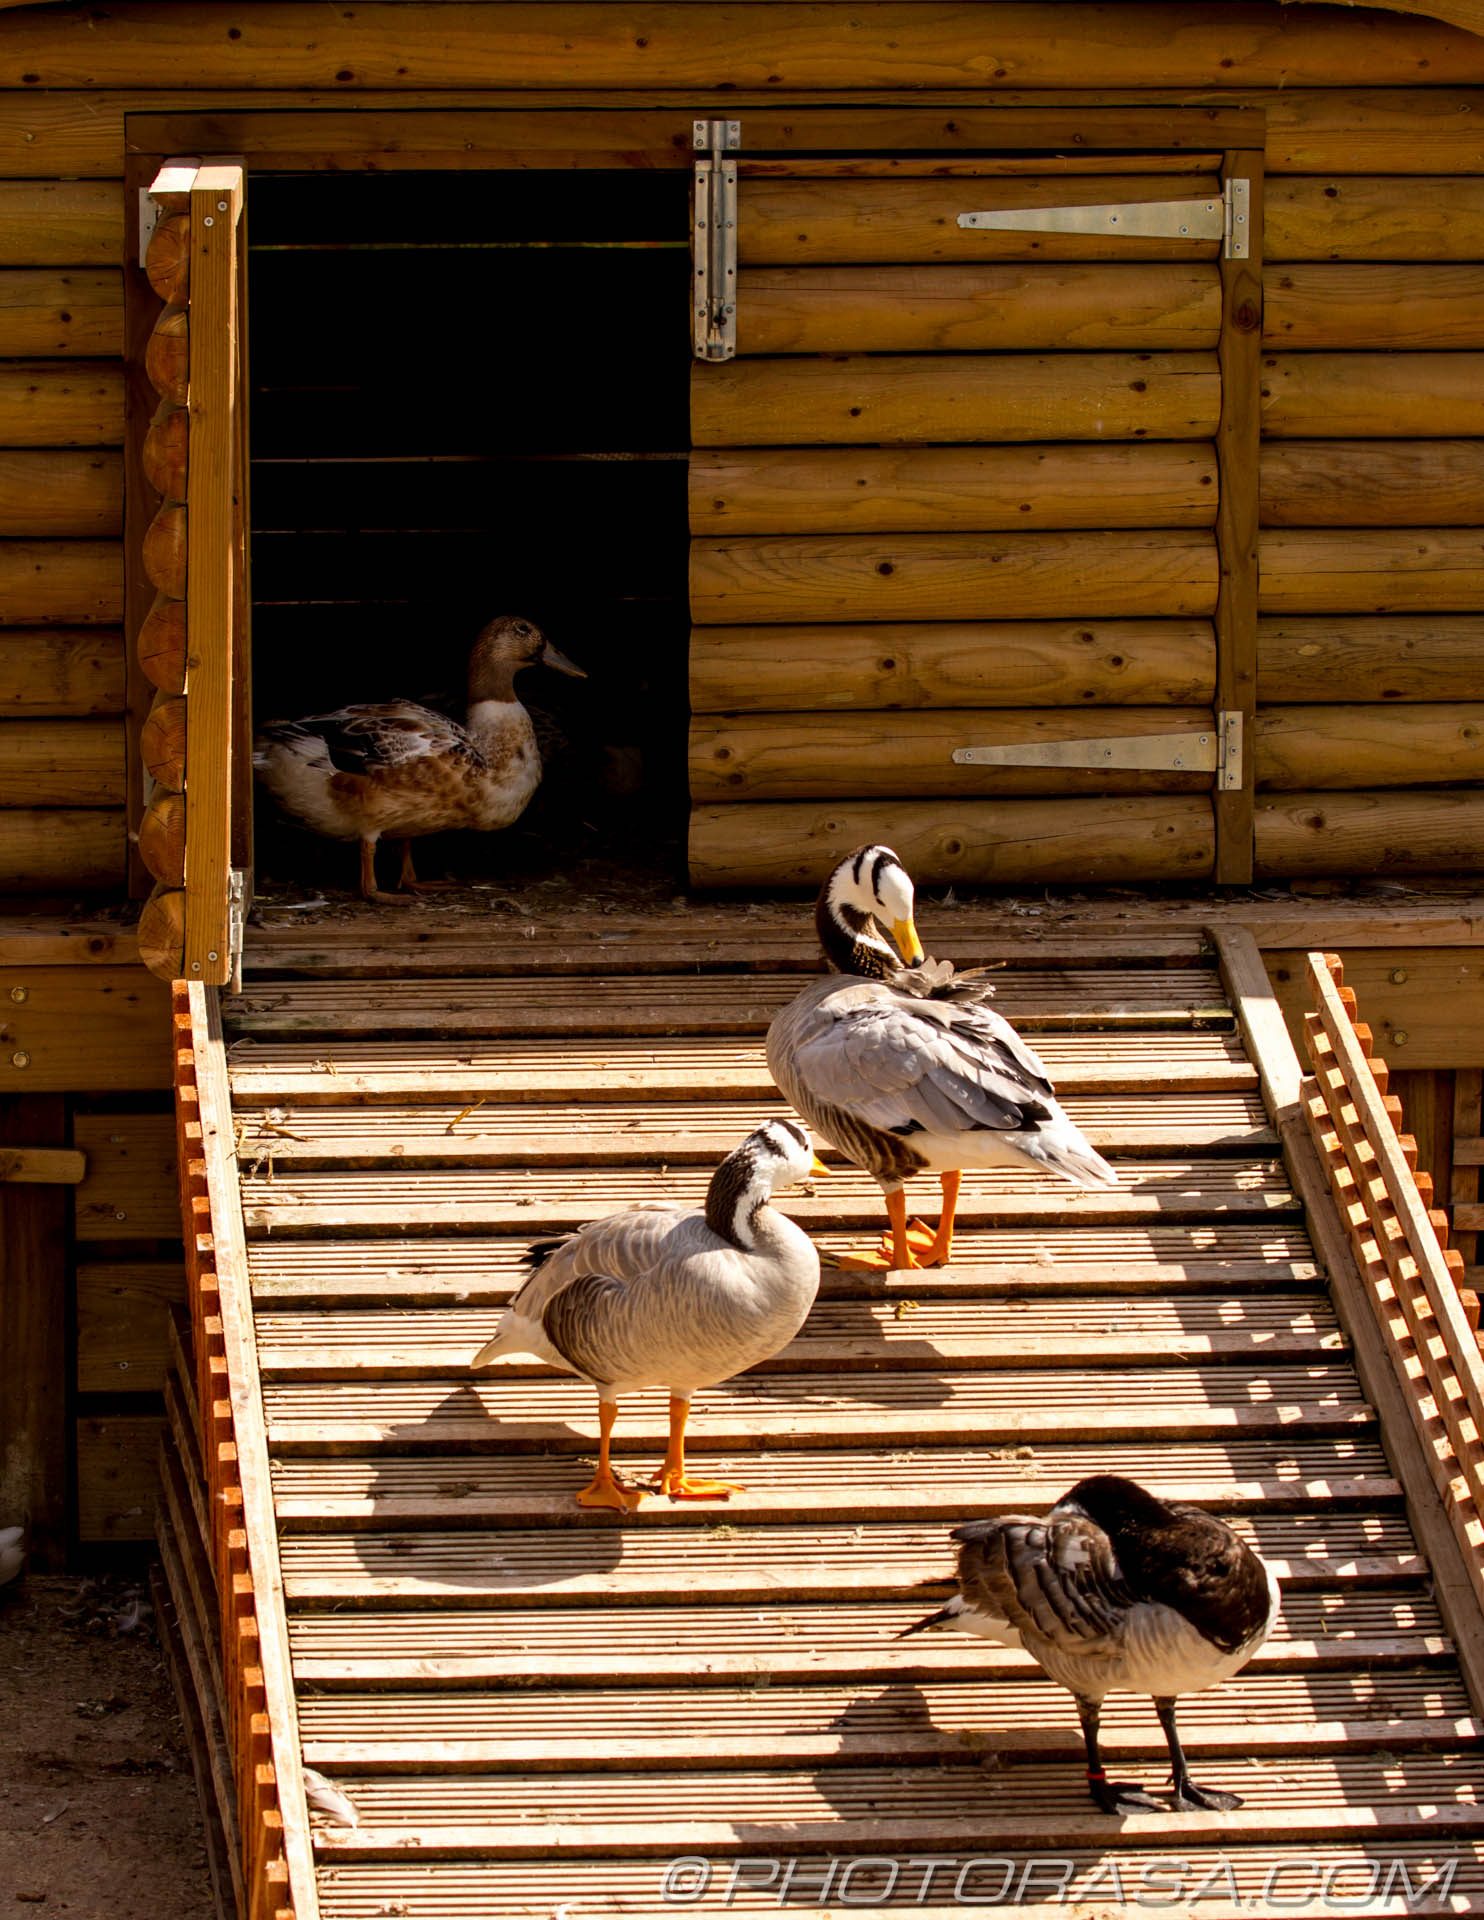 http://photorasa.com/birds-greenworld/at-the-bird-house/